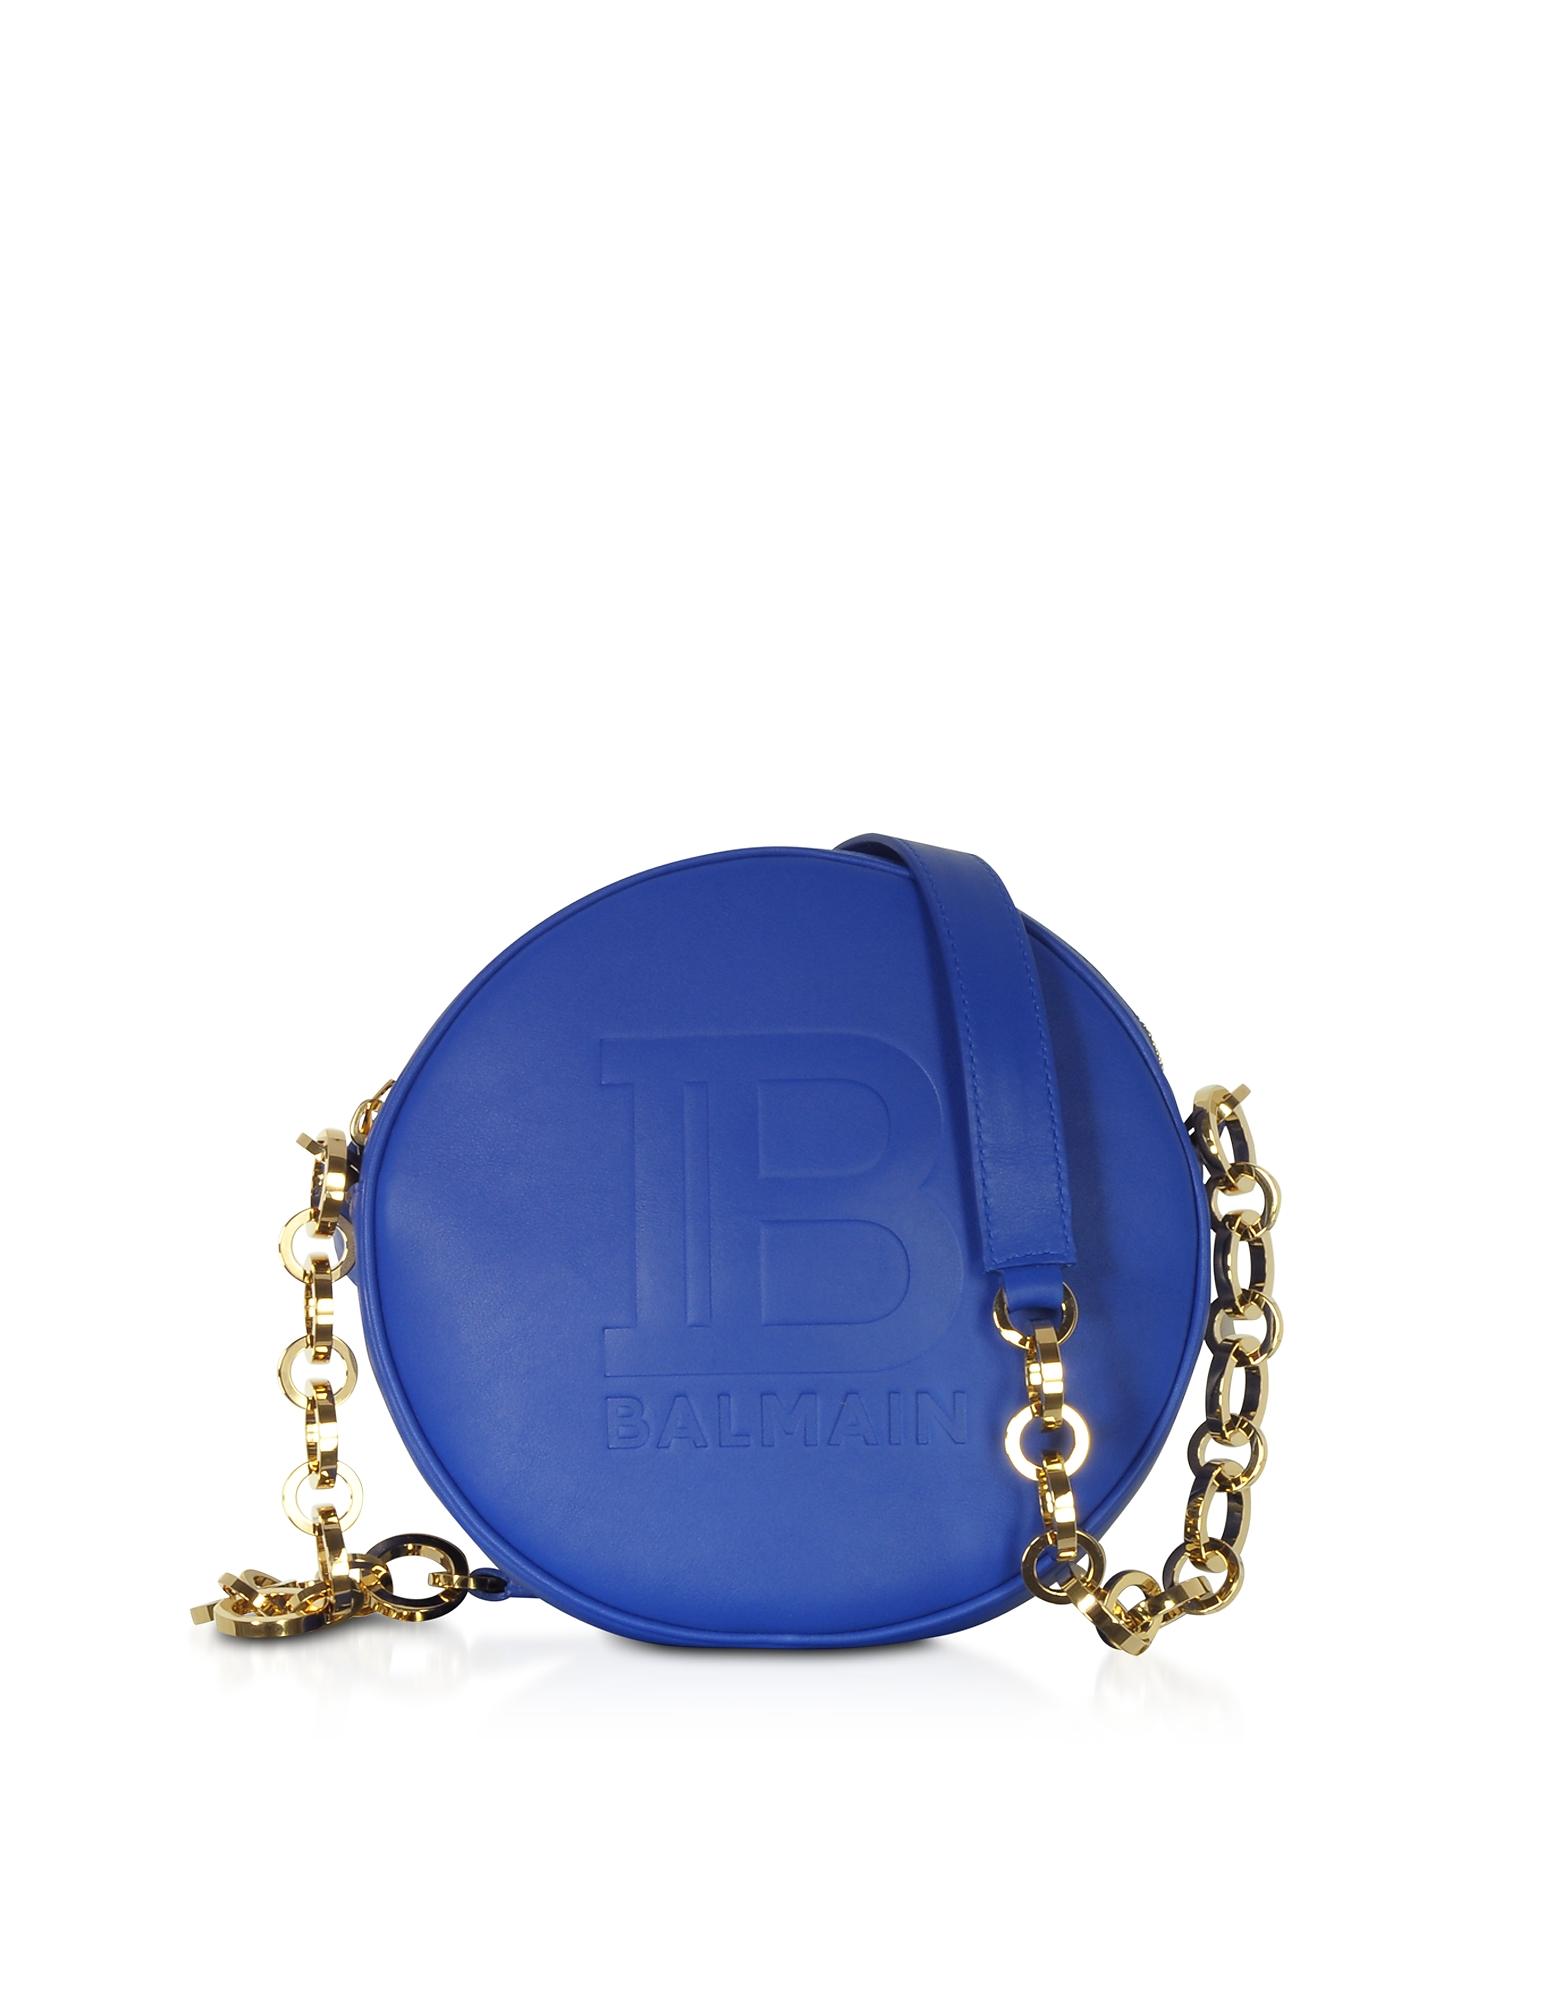 Balmain Designer Handbags, Mini Disco Shoulder Bag